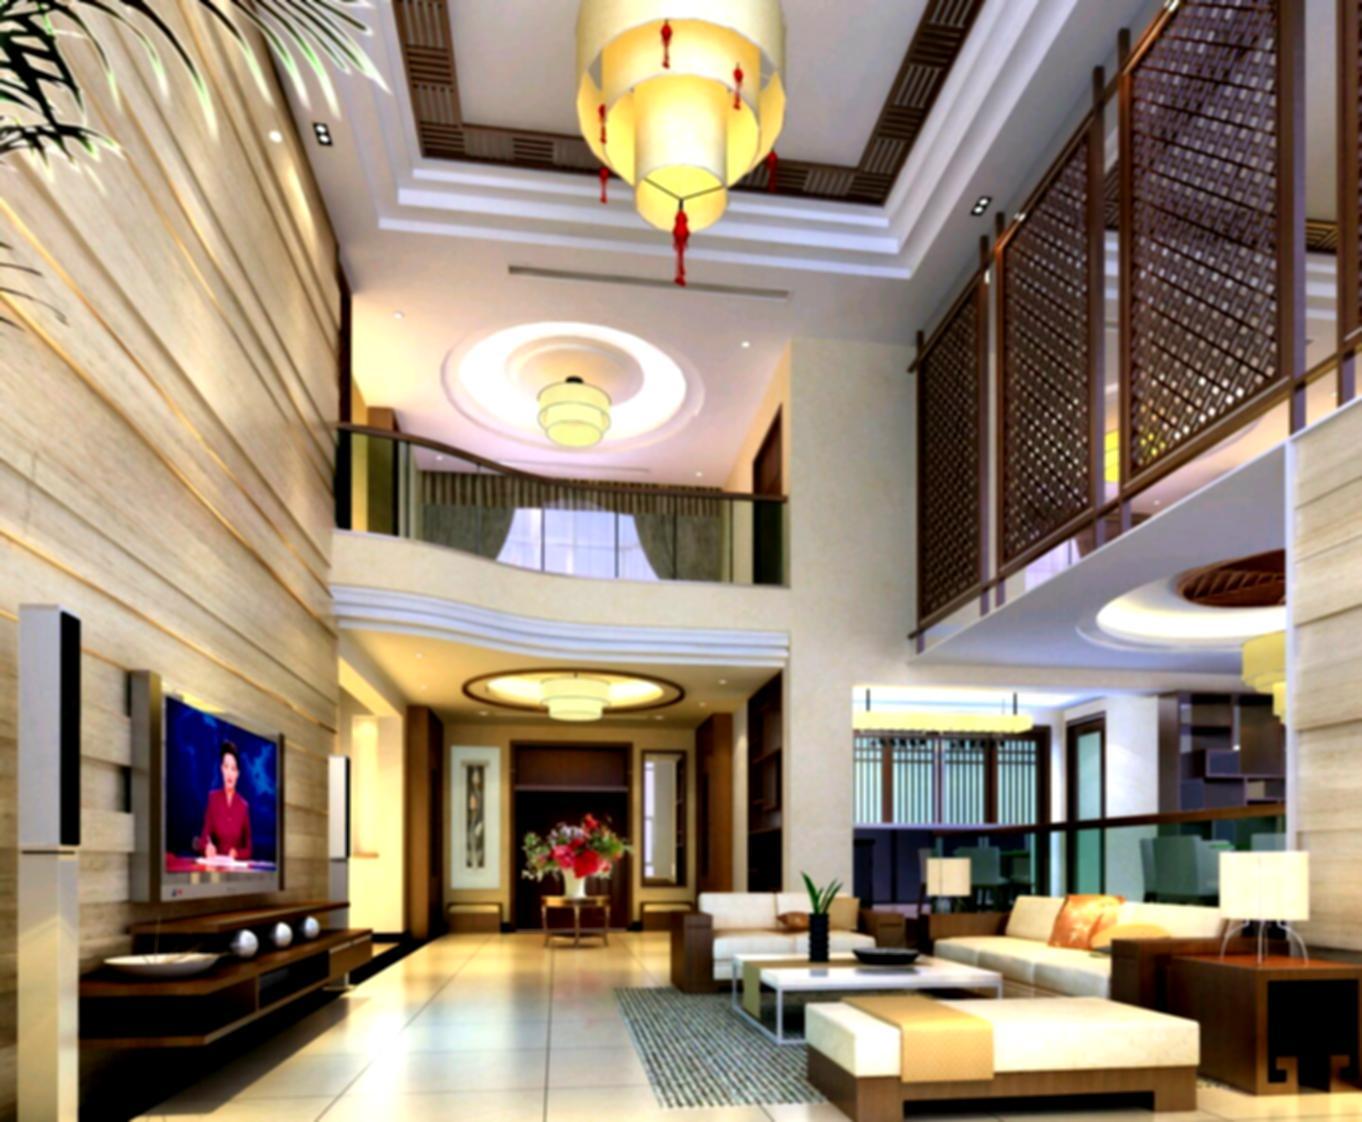 Cool Ultra Modern Interior Design With Impressive Houzz Ultra Modern Interior Design Be Awesome Interior